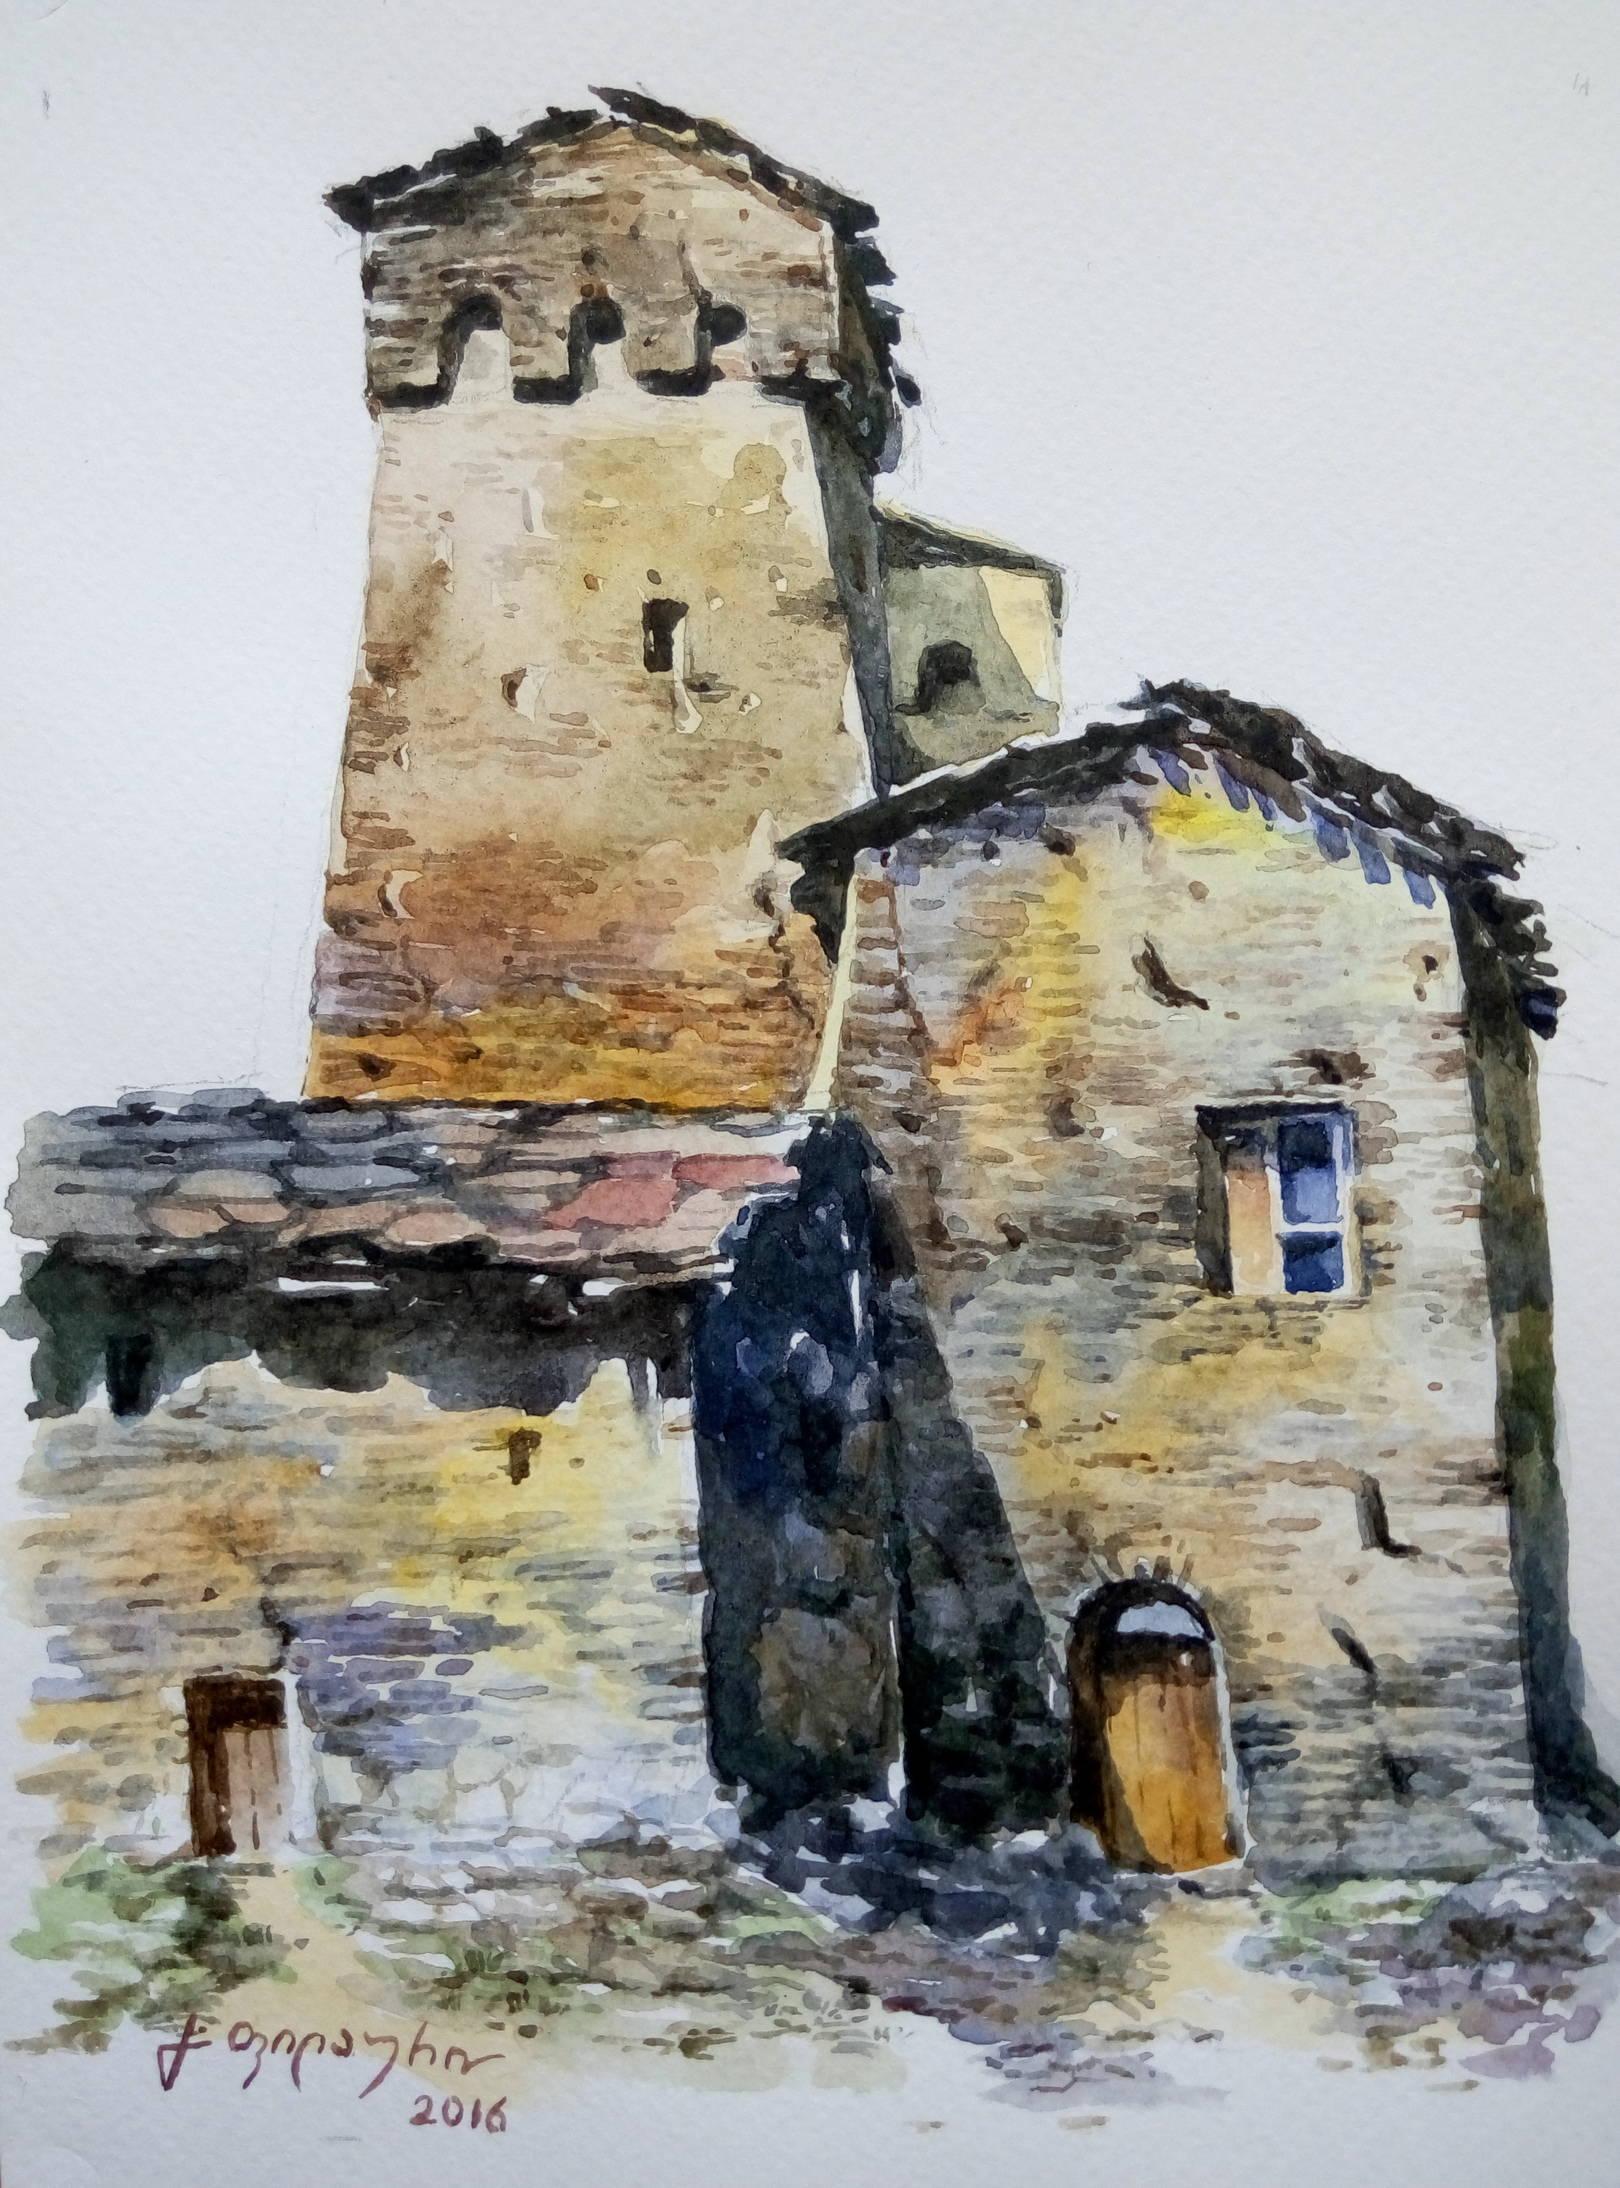 «Сванети»         бумага, акварель «Svaneti»           paper, aquarelle  20x15, 2016